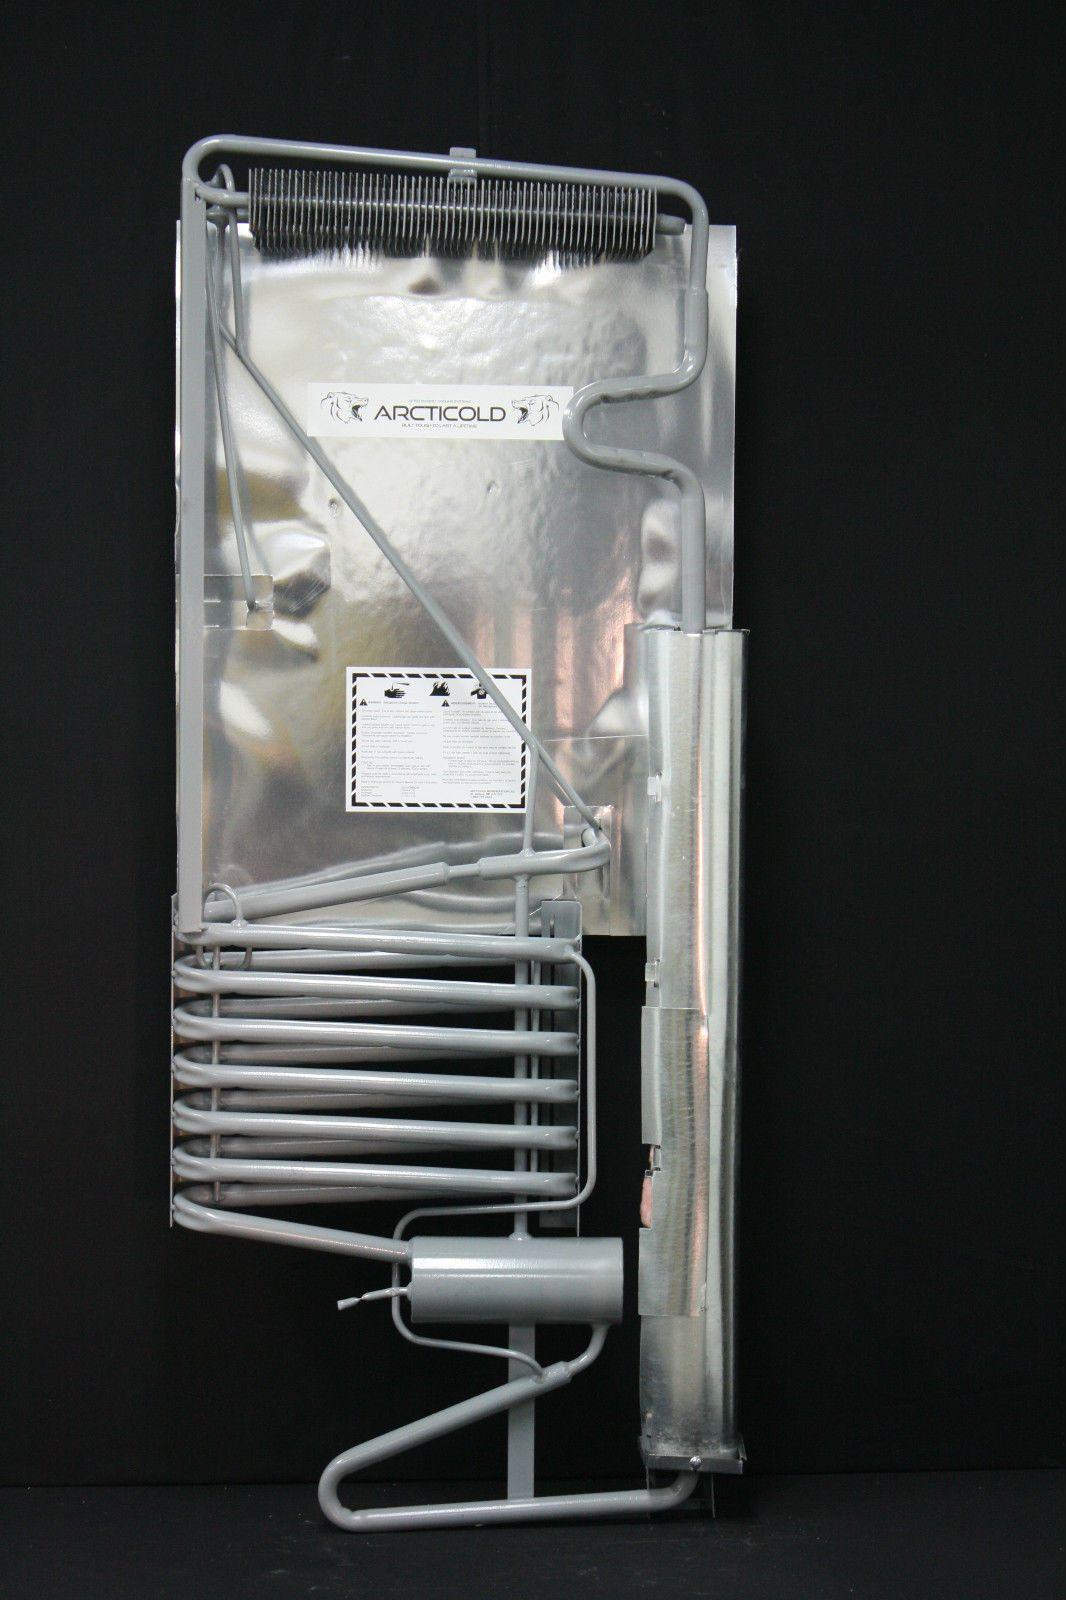 Arcticold New Lifetime Warranty Aftermarket Cooling Unit For Norcold N621 Cooling Unit Fridge Repair The Unit